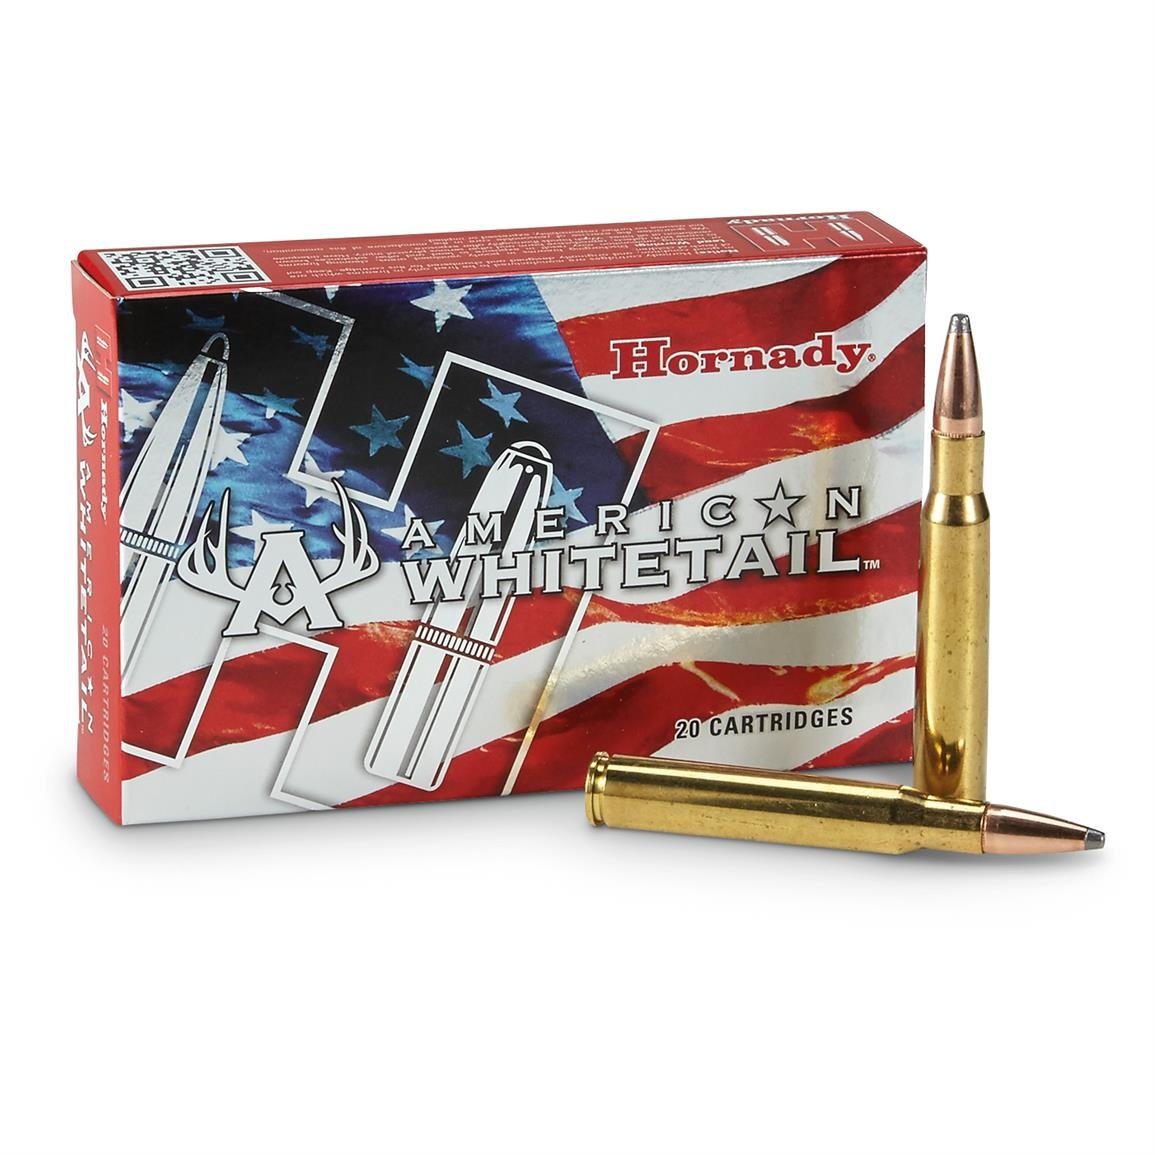 Hornady American Whitetail 7mm-08 Rem, 139 gr Interlock SP (20 Pk)